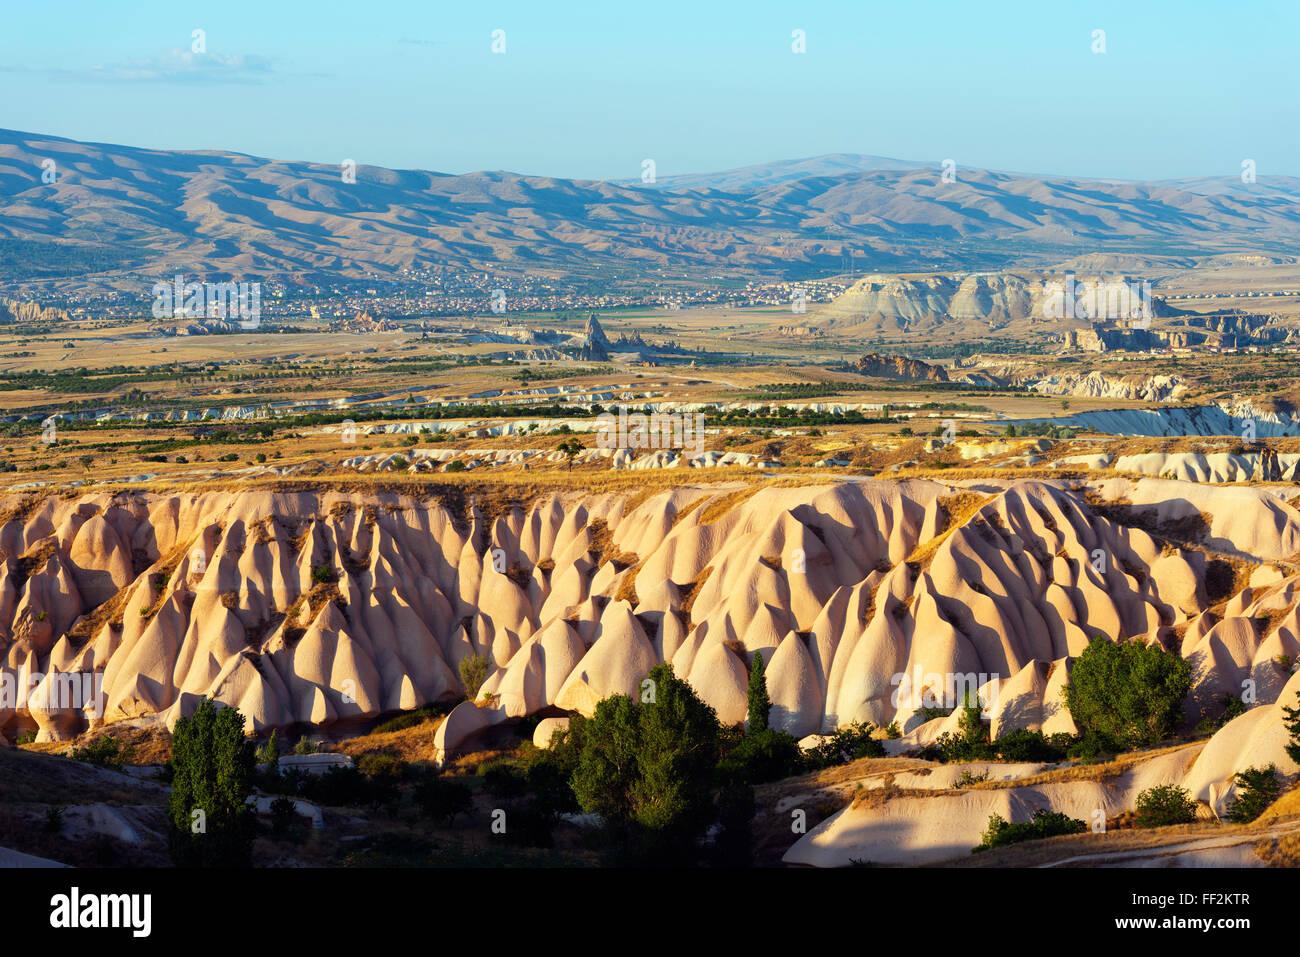 Rock-cut topography at Uchisar, UNESCO WorRMd Heritage Site, Cappadocia, AnatoRMia, Turkey, Asia Minor, Eurasia - Stock Image